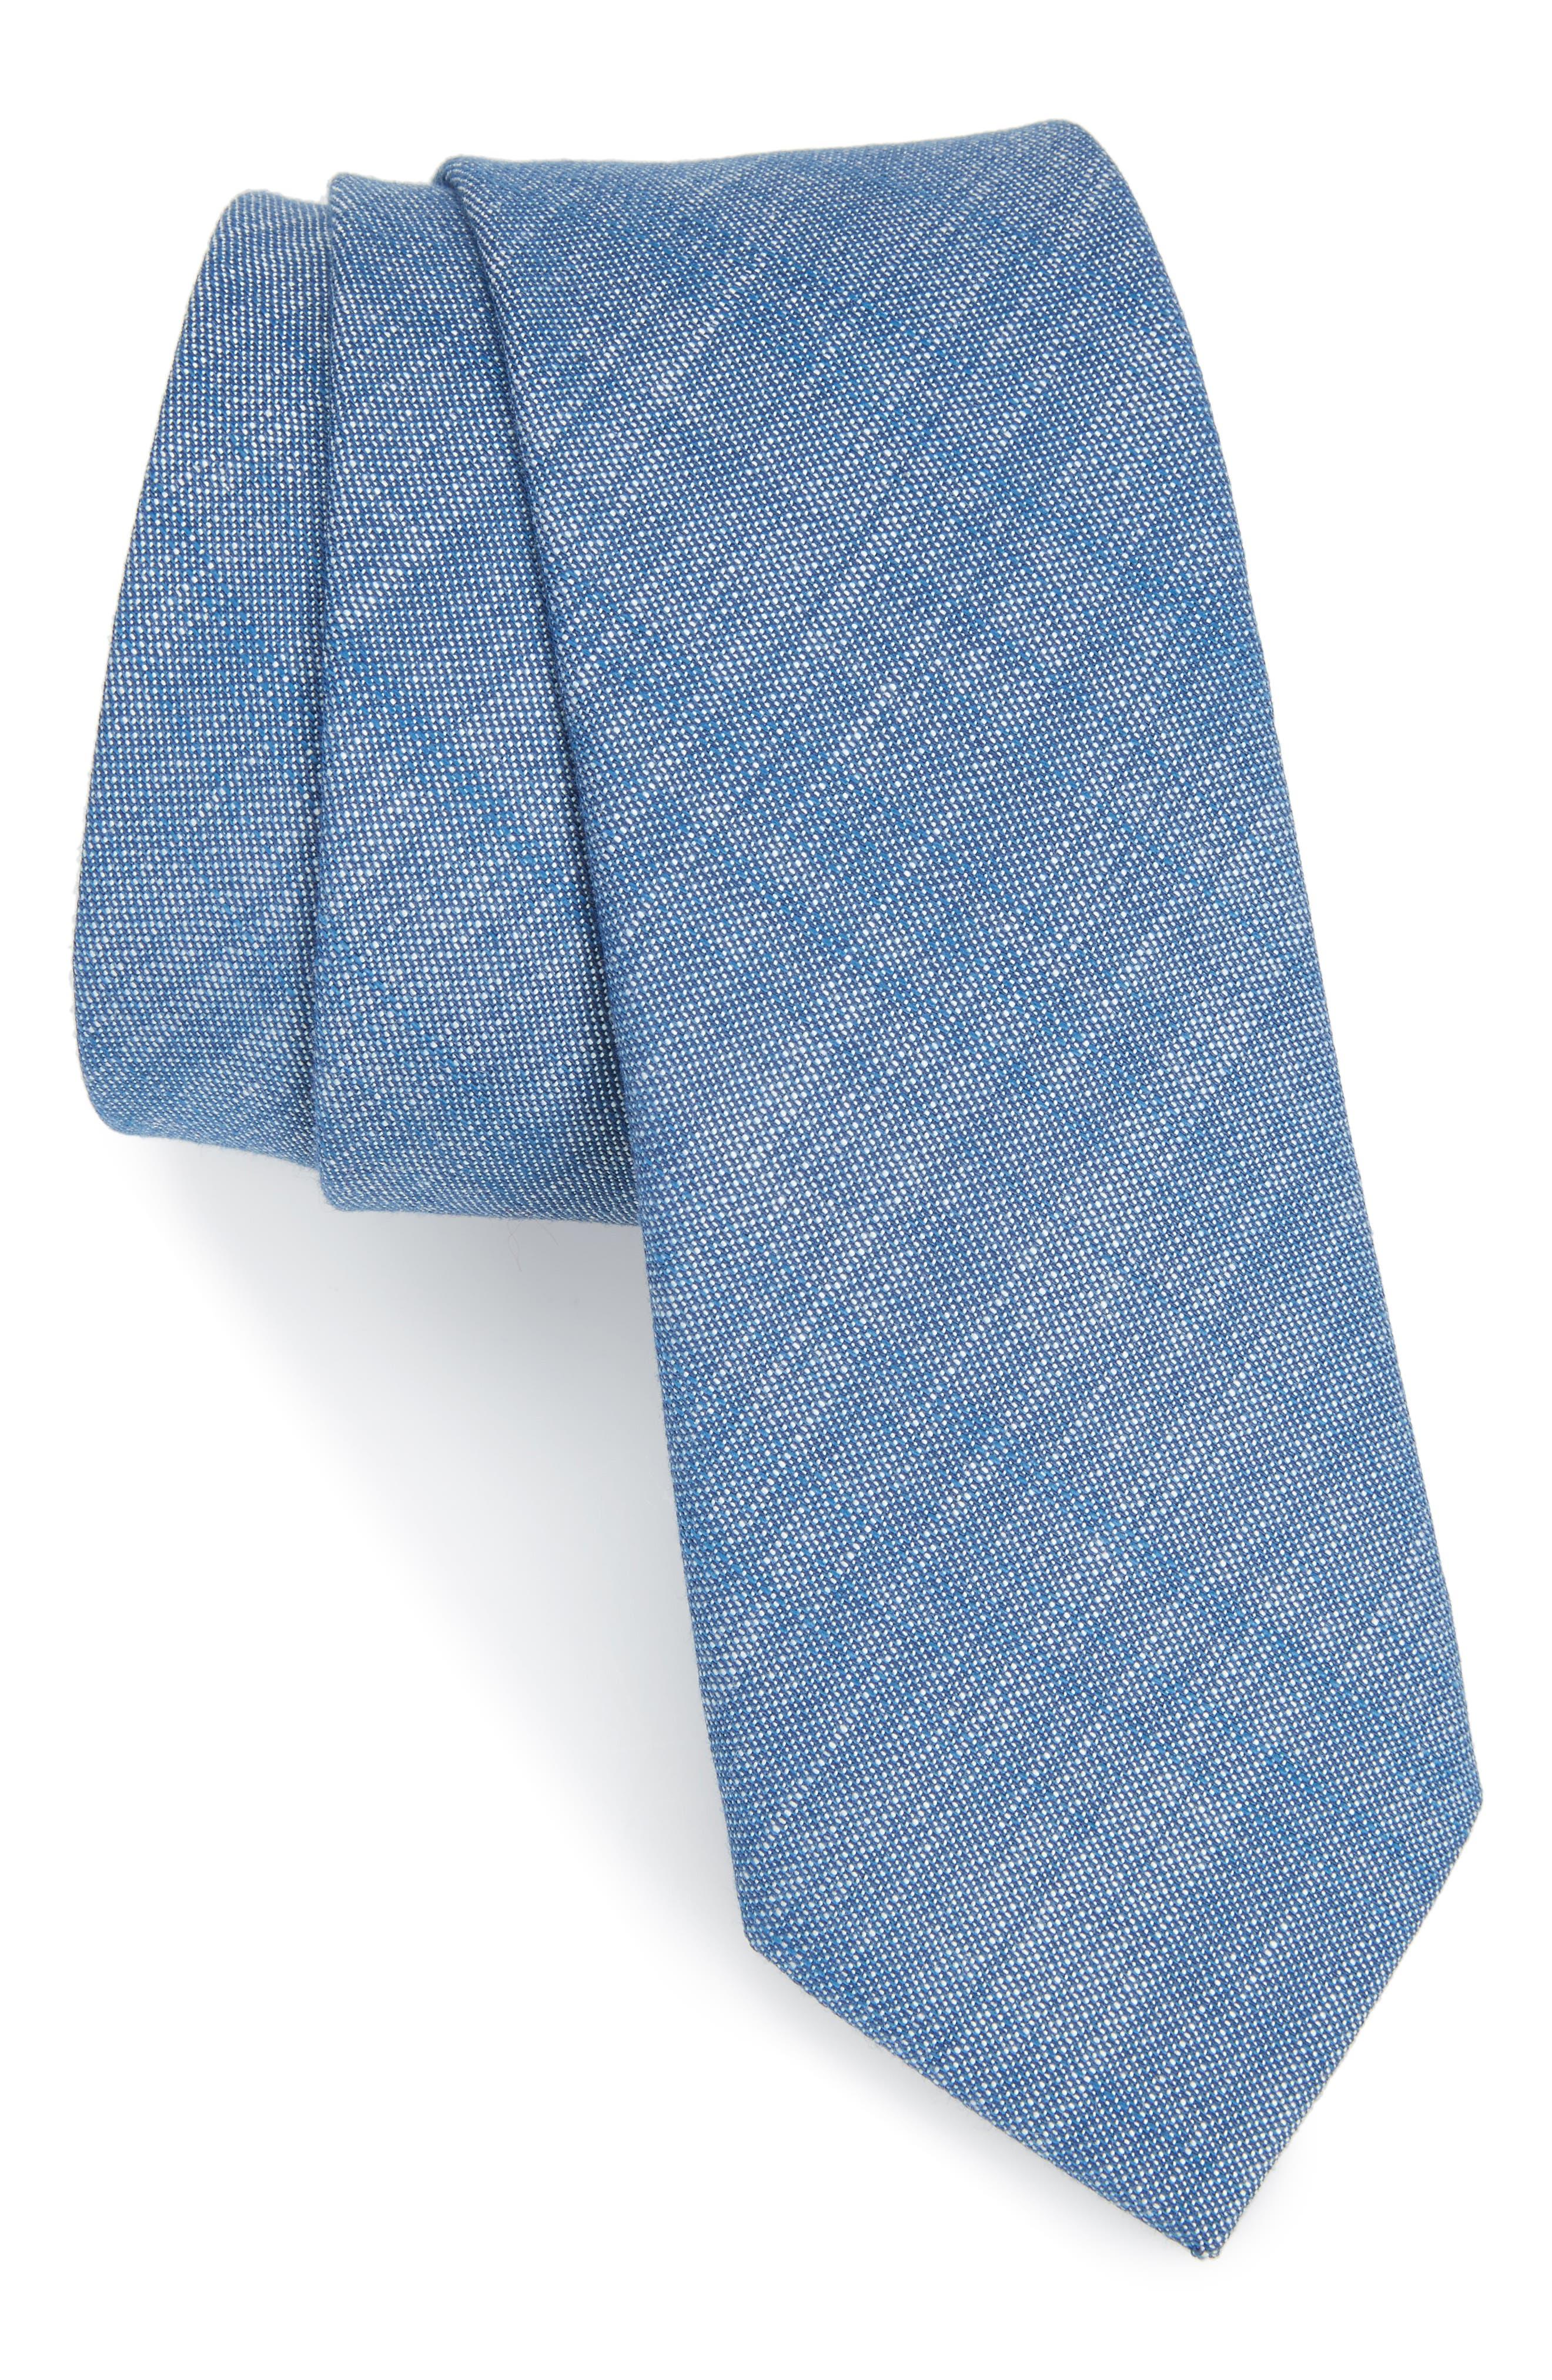 Main Image - Nordstrom Men's Shop Tyler Solid Cotton Skinny Tie